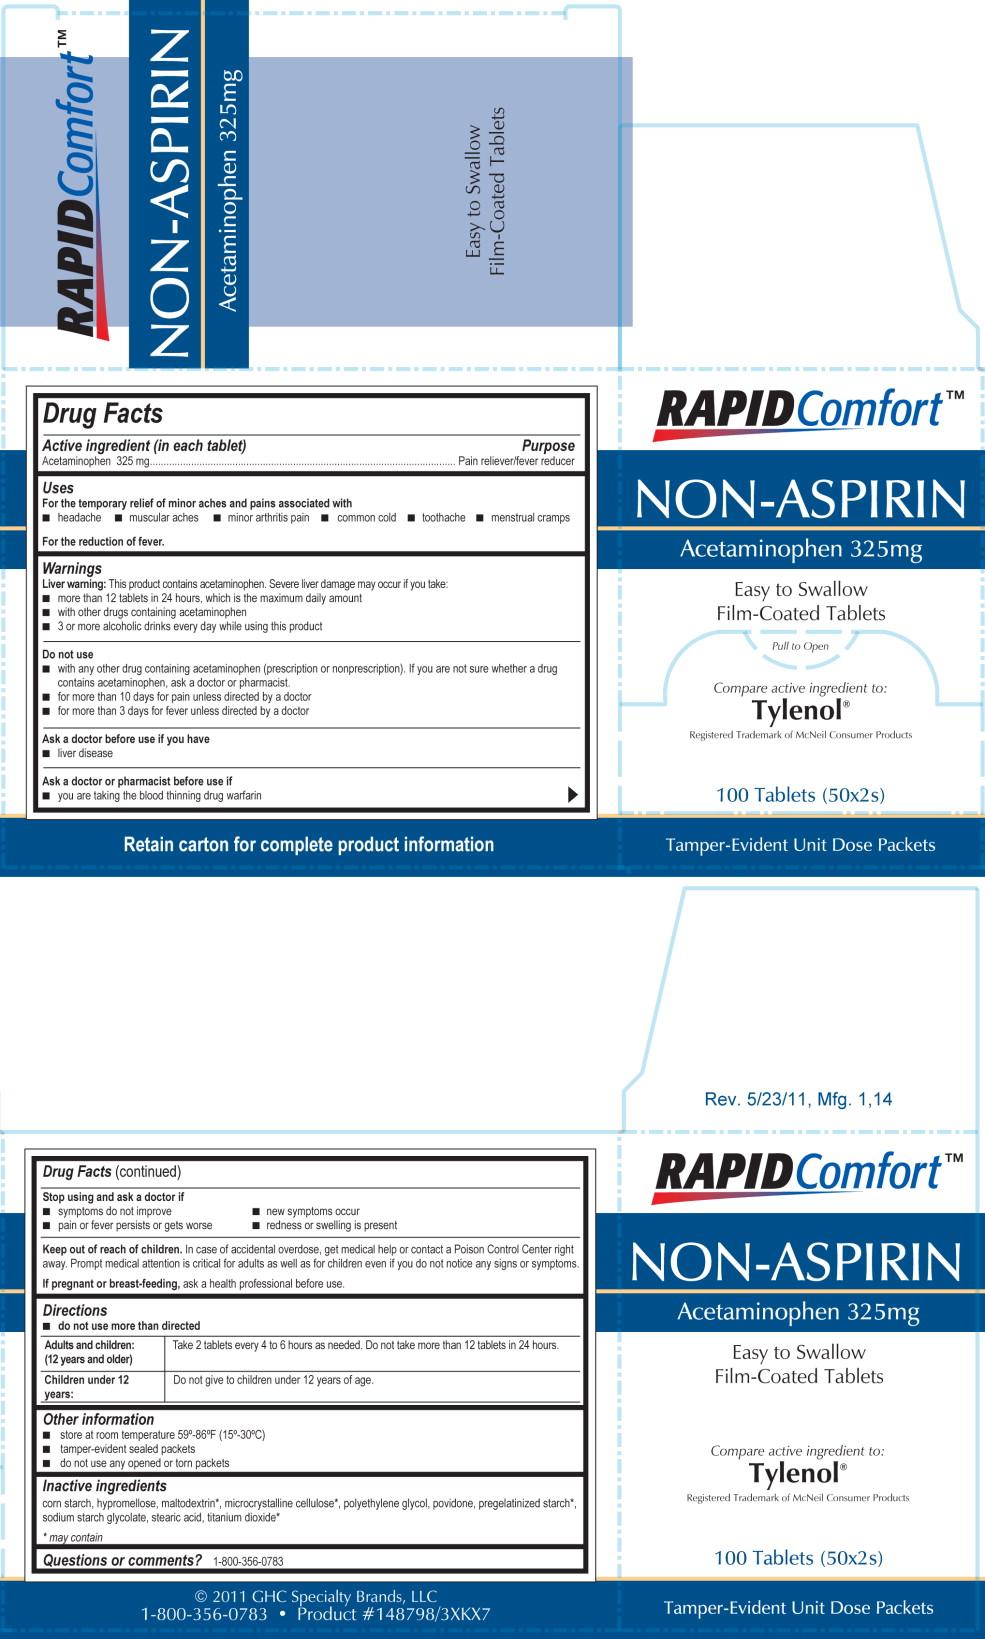 145R LSS Non-Aspirin 325 mg Label